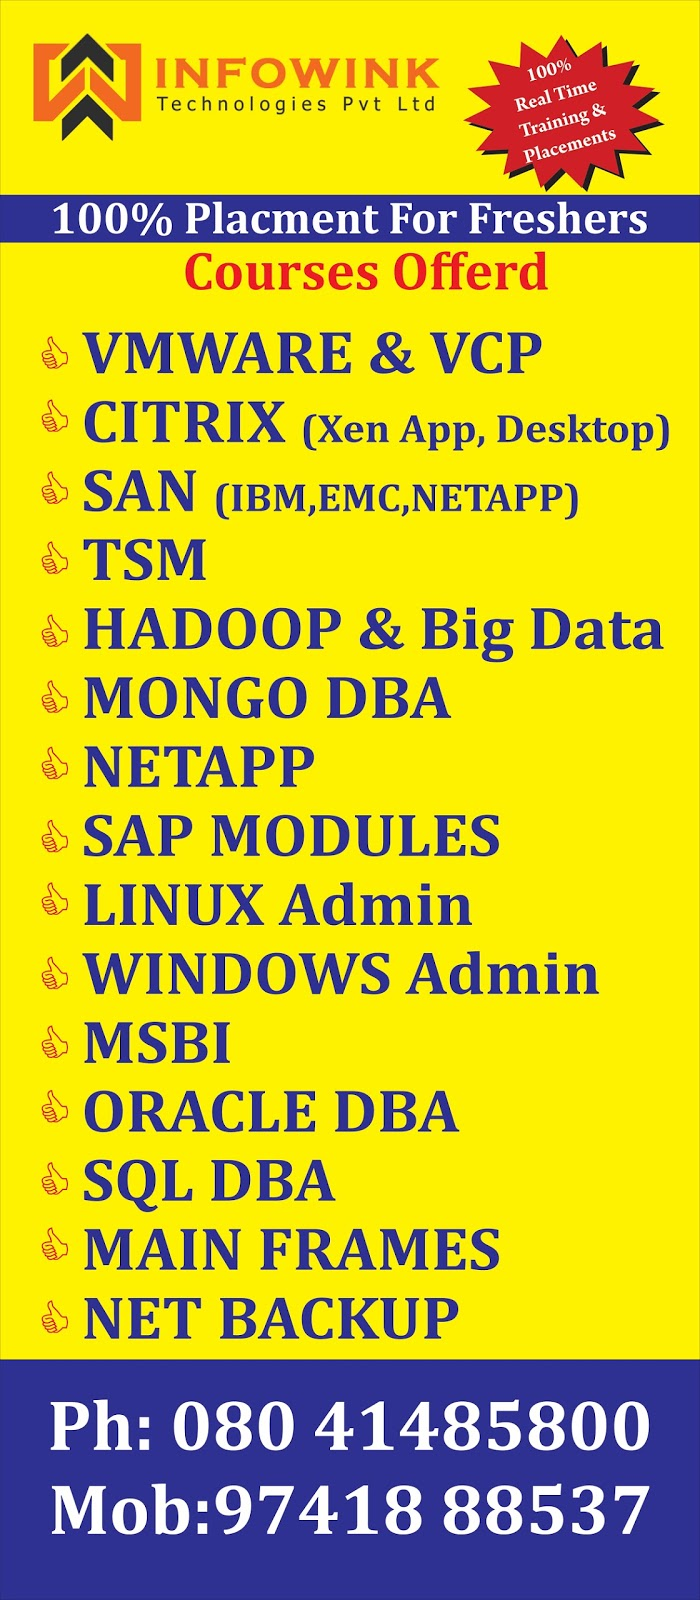 infowink technologies pvt  infowink technologies is best trainings vmware citrix windows hadoop big data informatica netapp netbackup emc san sforce crm software testing sap hr